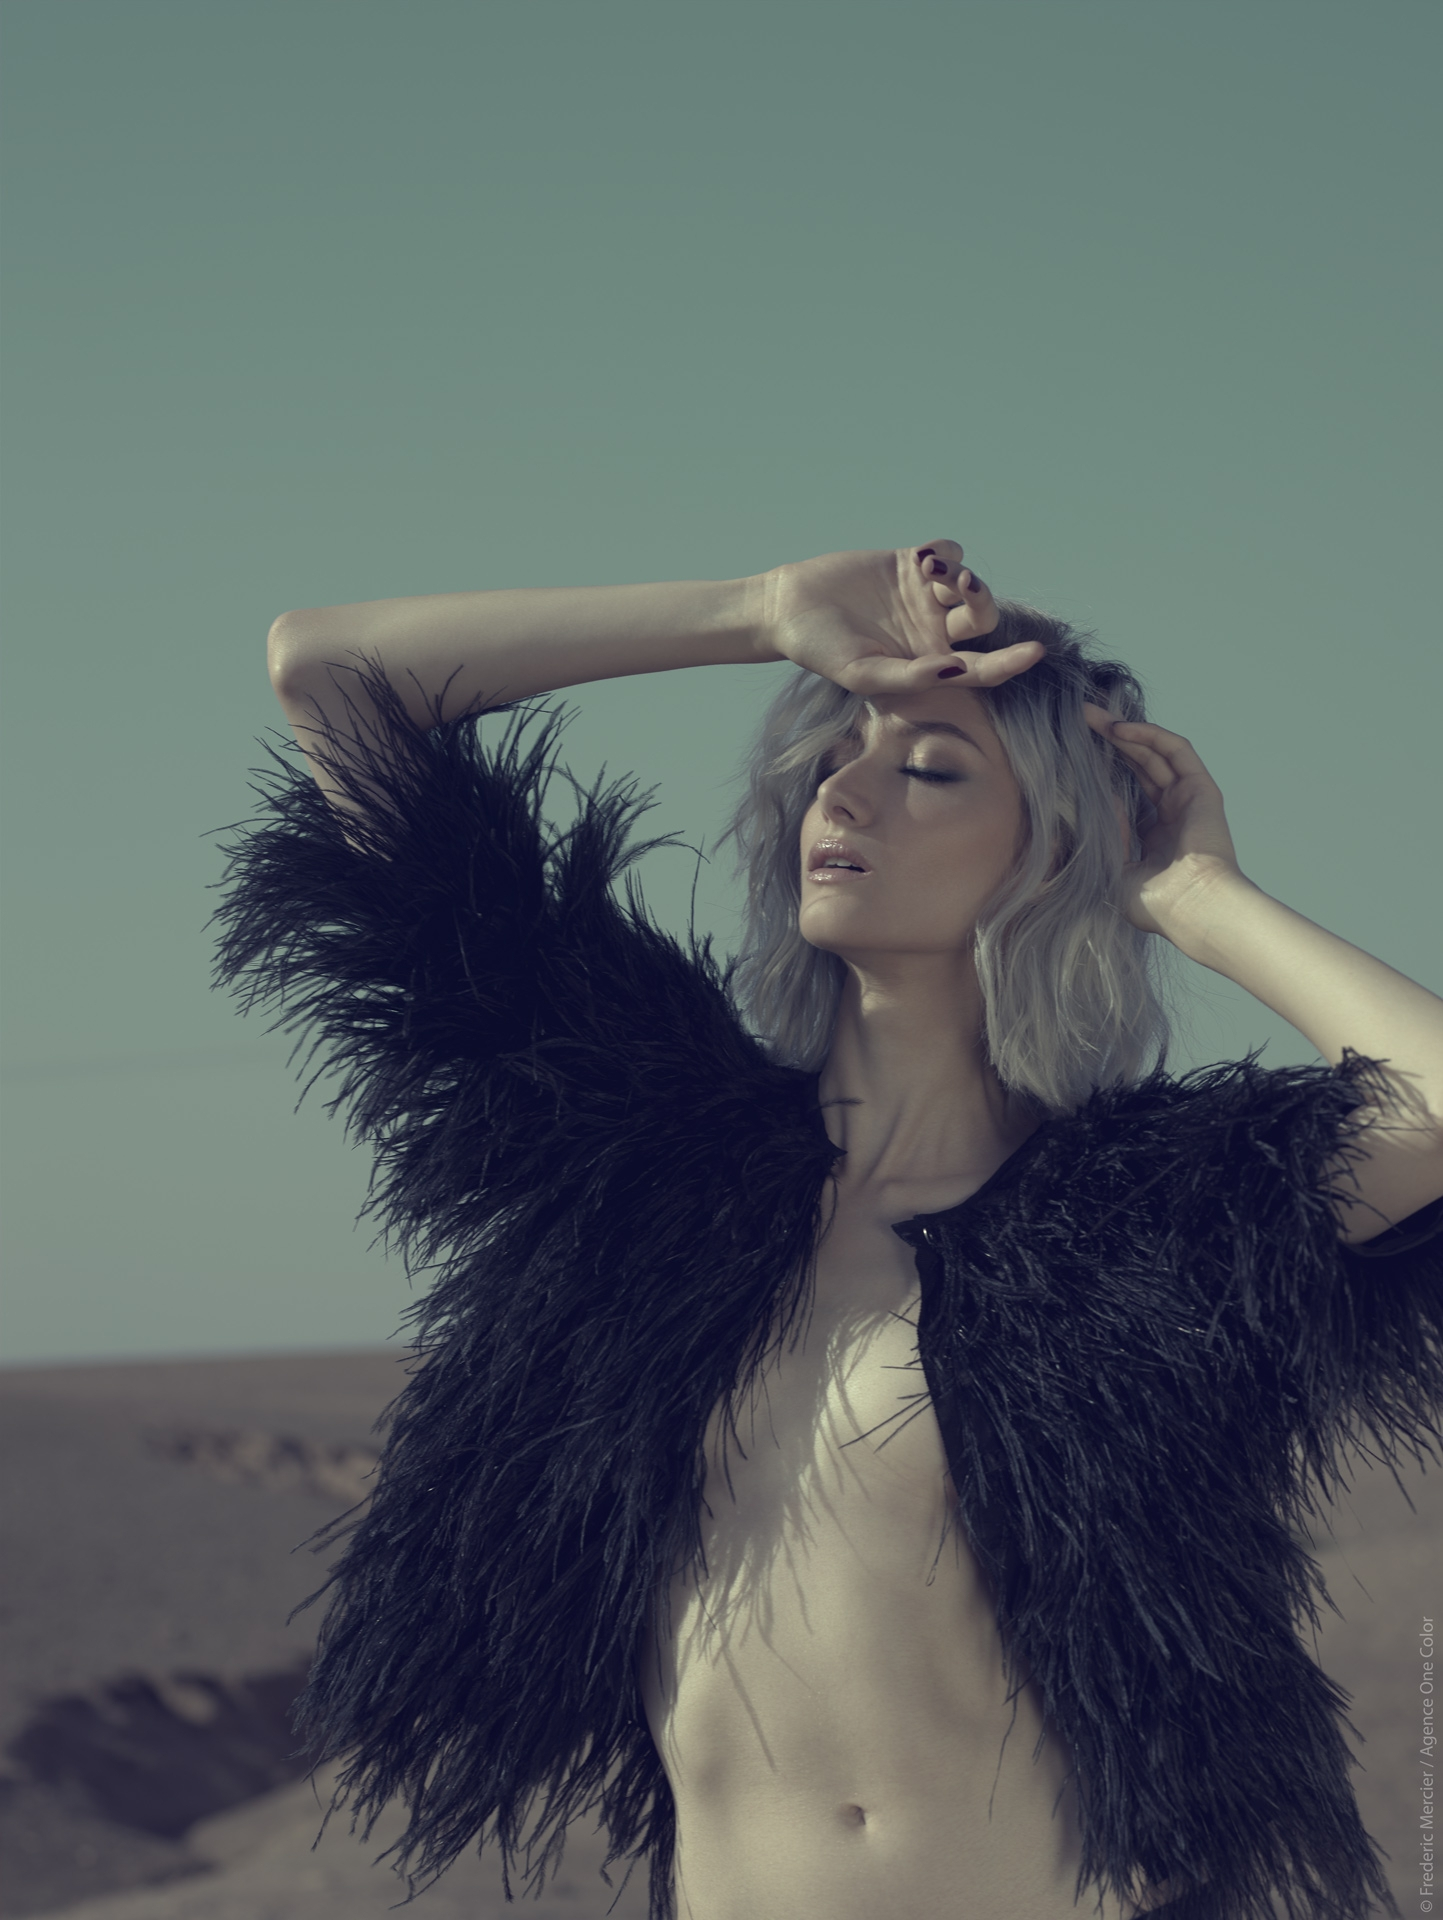 desert american wild lifestyle lingerie maje frederic mercier photographer one color